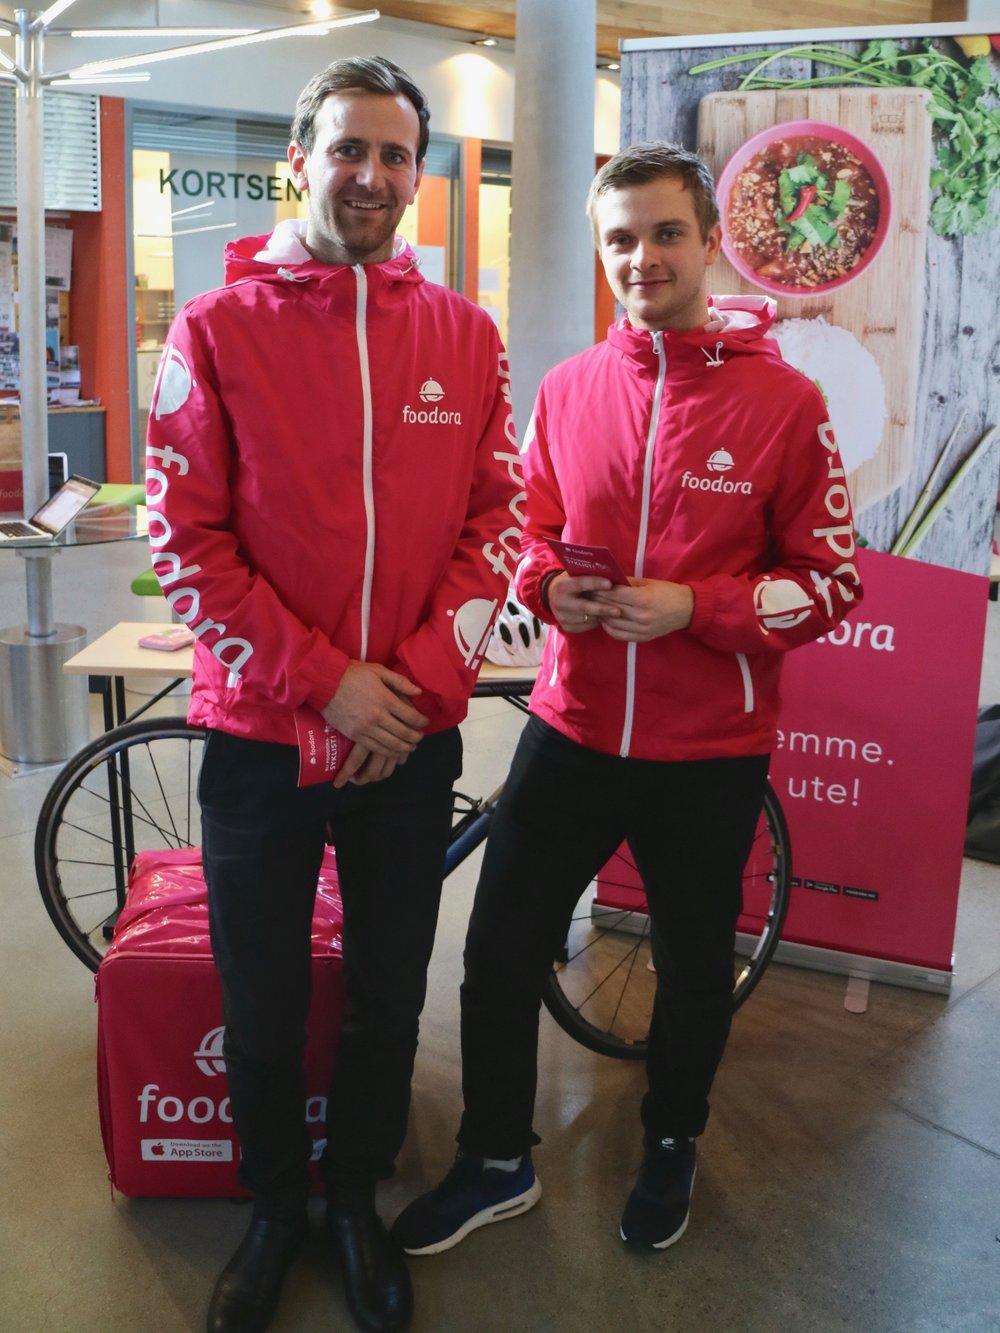 Dan Ruben Aadland og Simen Bones fra Foodora